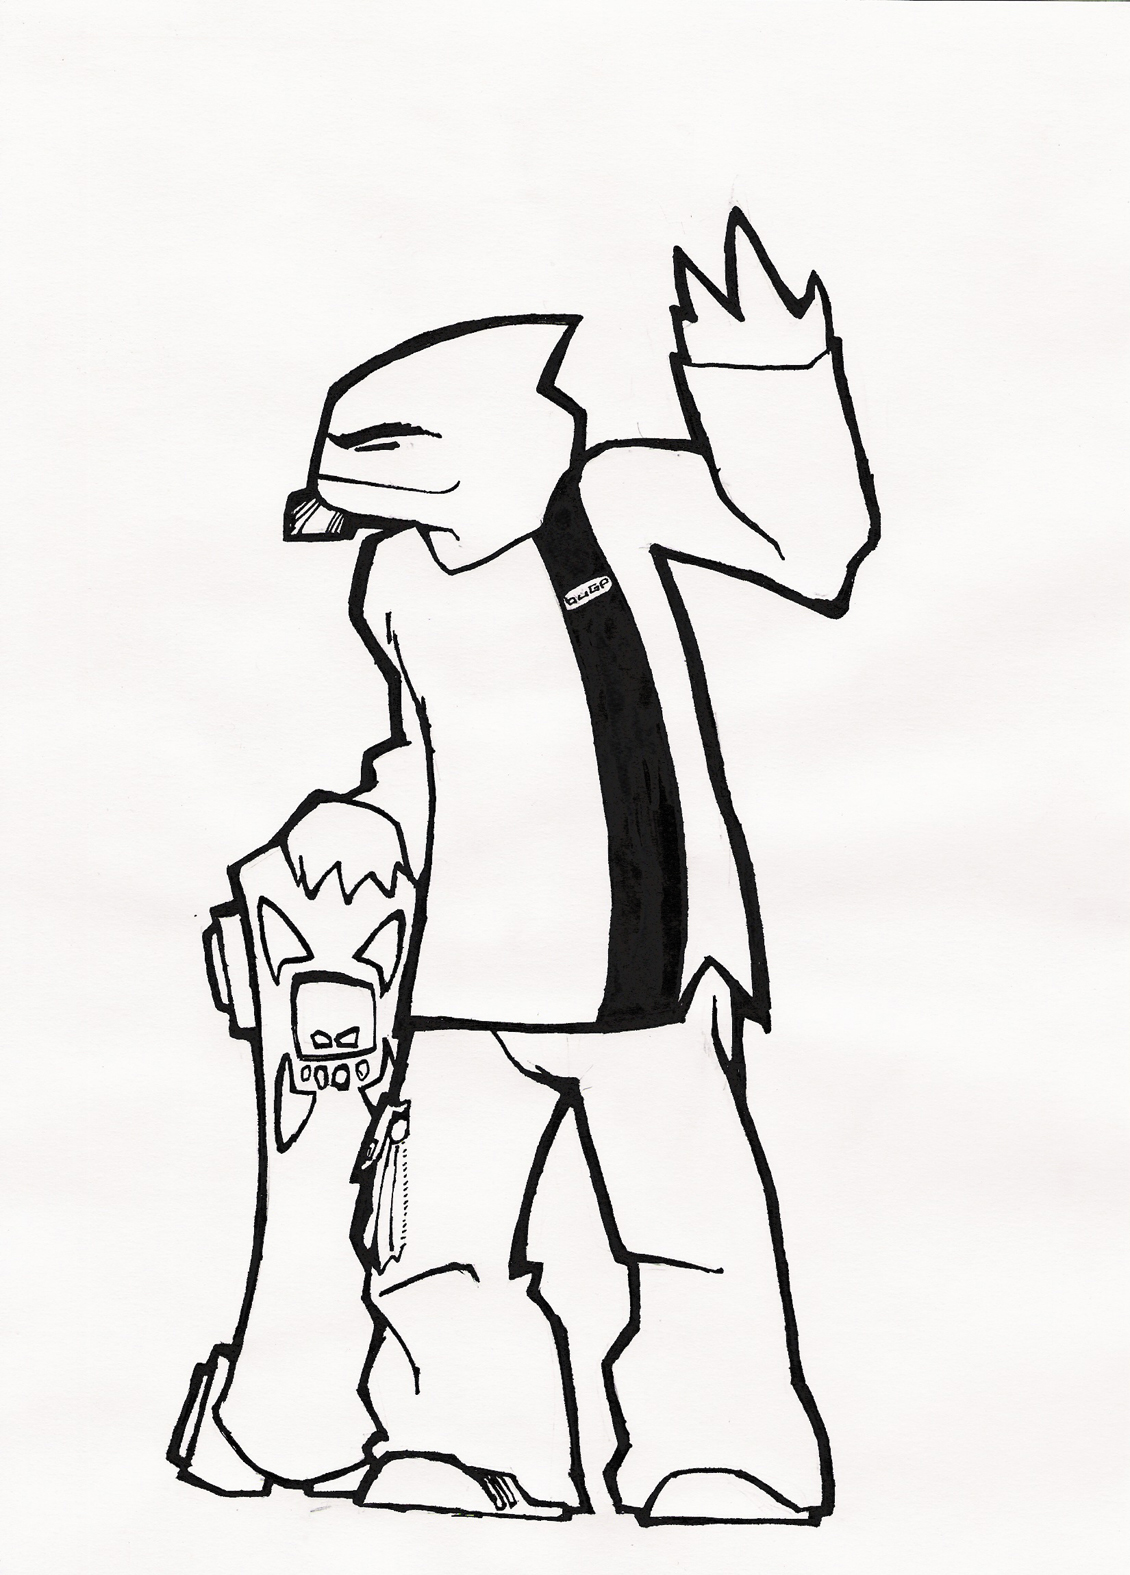 Bug Purr - Mascotte #3